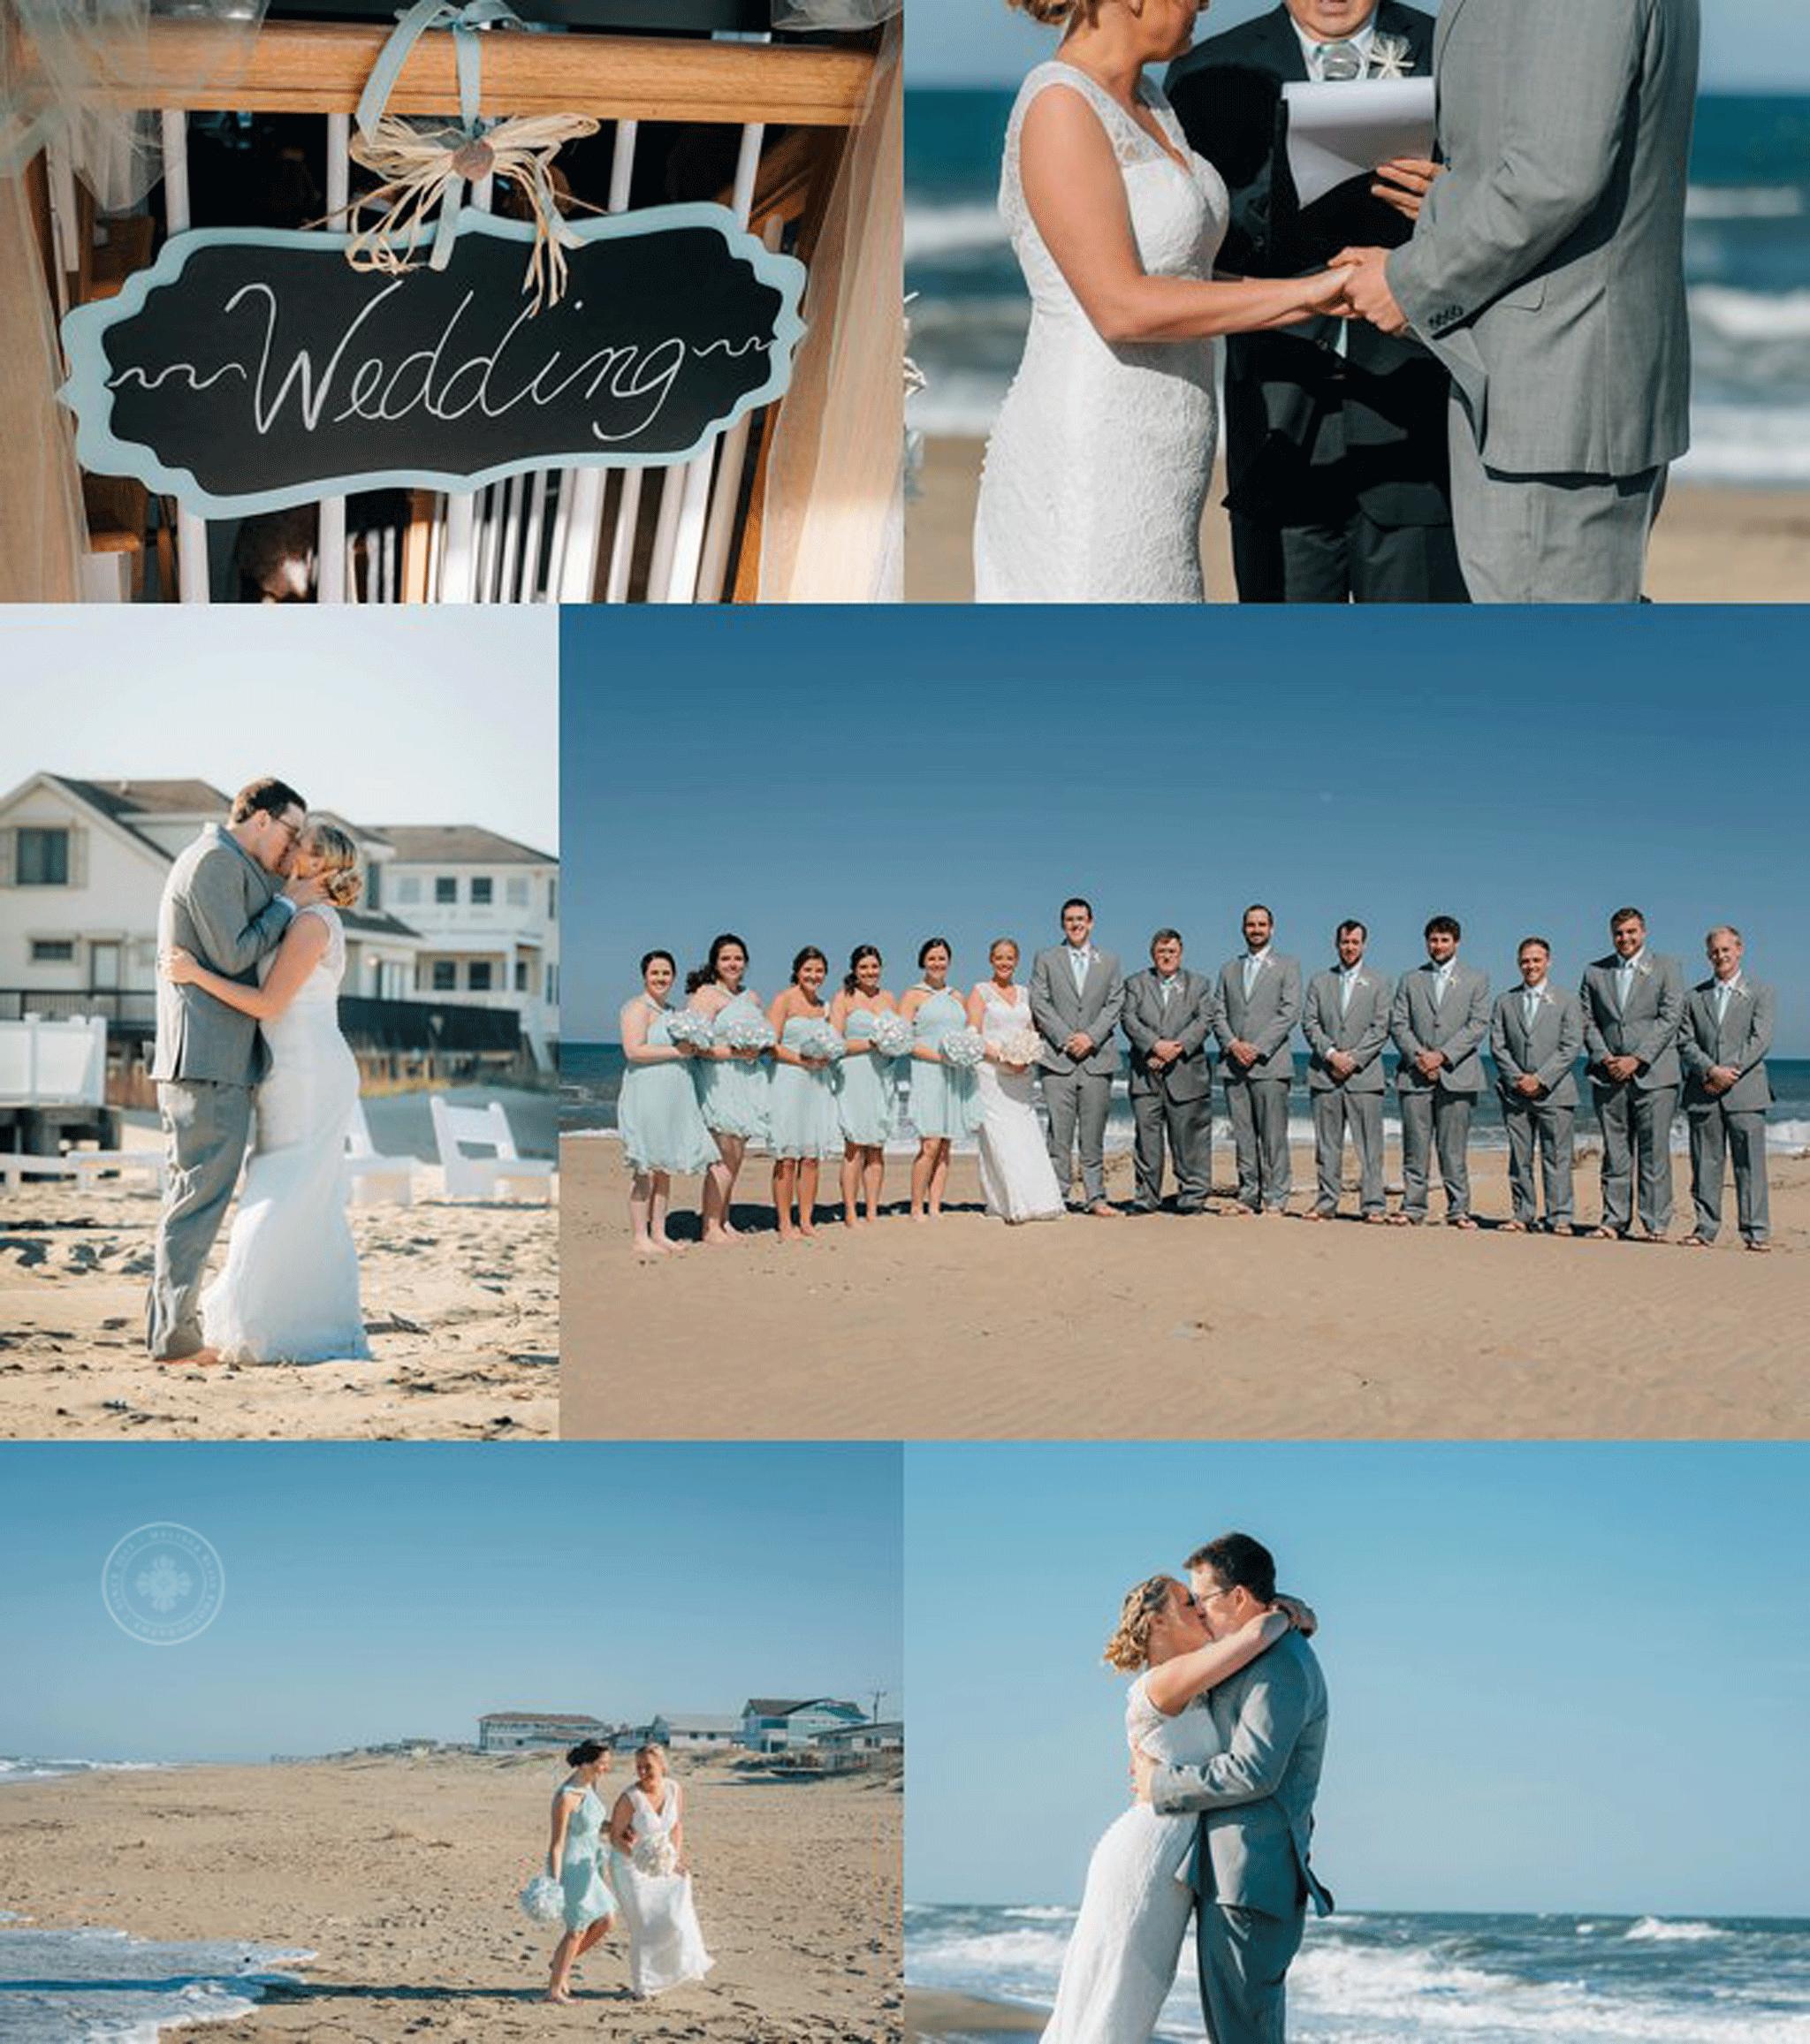 sandbridge-beach-wedding-photographers-virginia-beach-norfolk-portsmouth-professional-wedding-photographer-melissa-bliss-photography-real-weddings-beach-ceremony.png